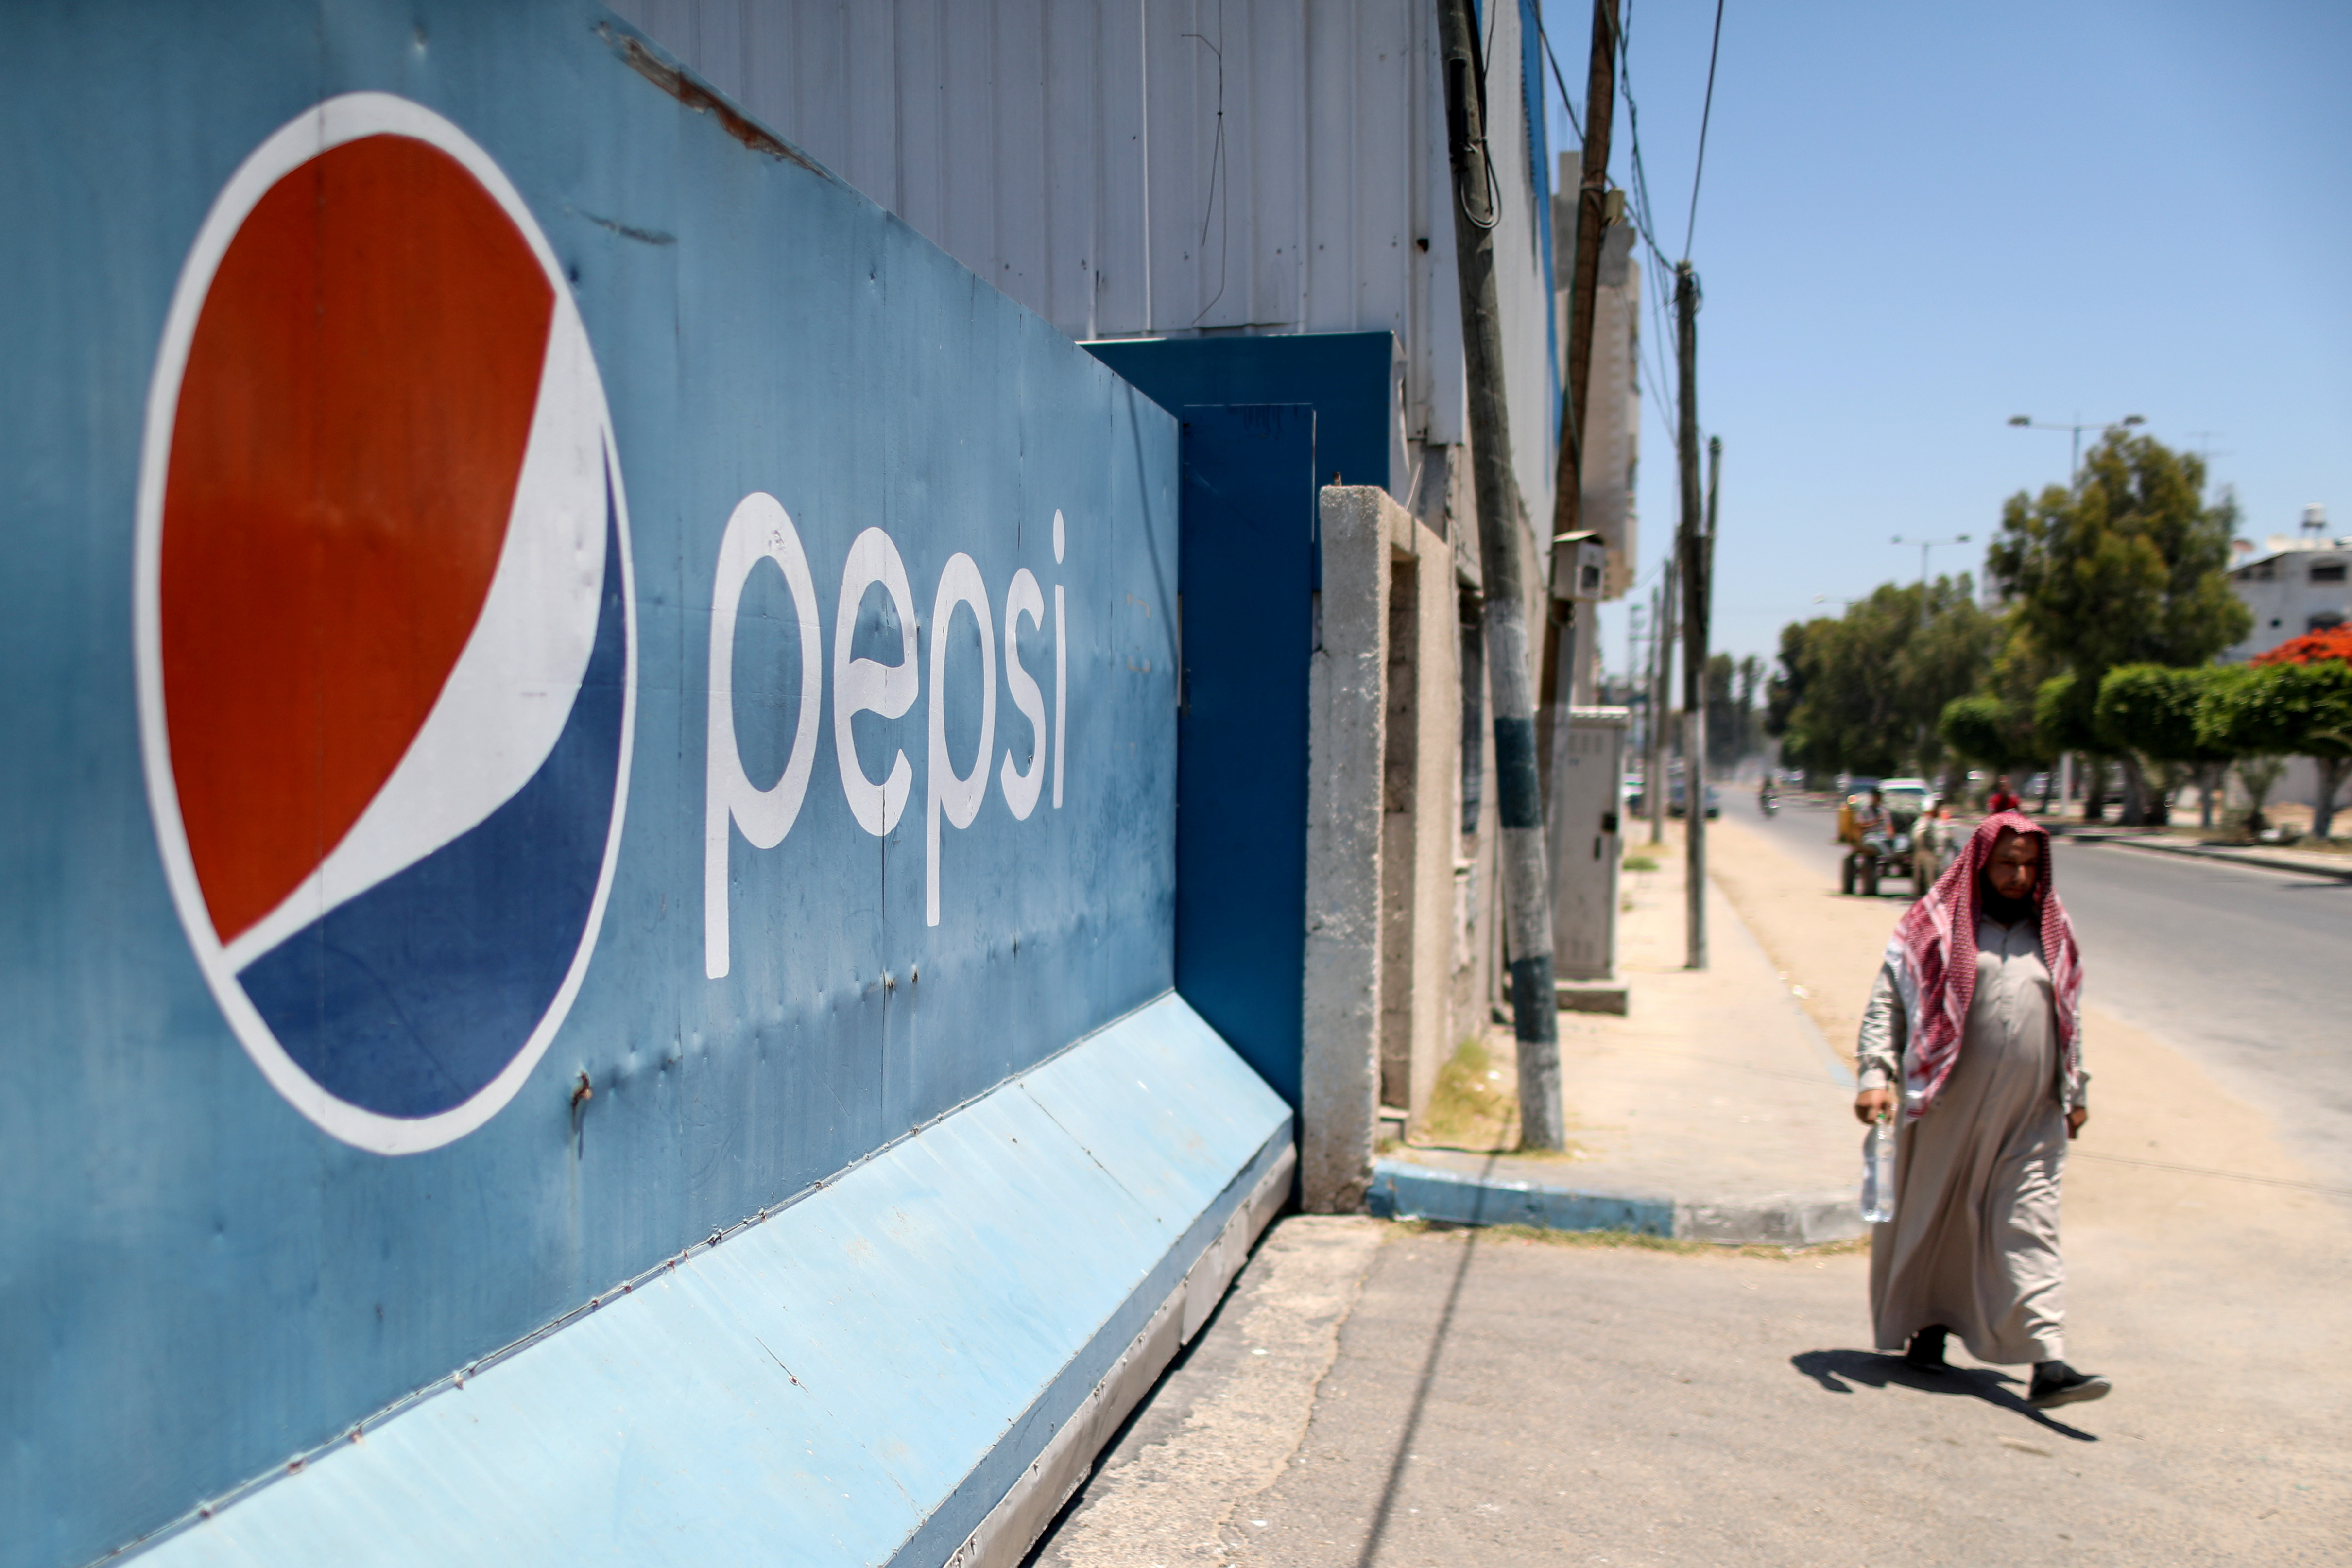 A Palestinian man walks past Gaza Pepsi factory for soft drinks in Gaza City June 21, 2021. REUTERS/Mohammed Salem